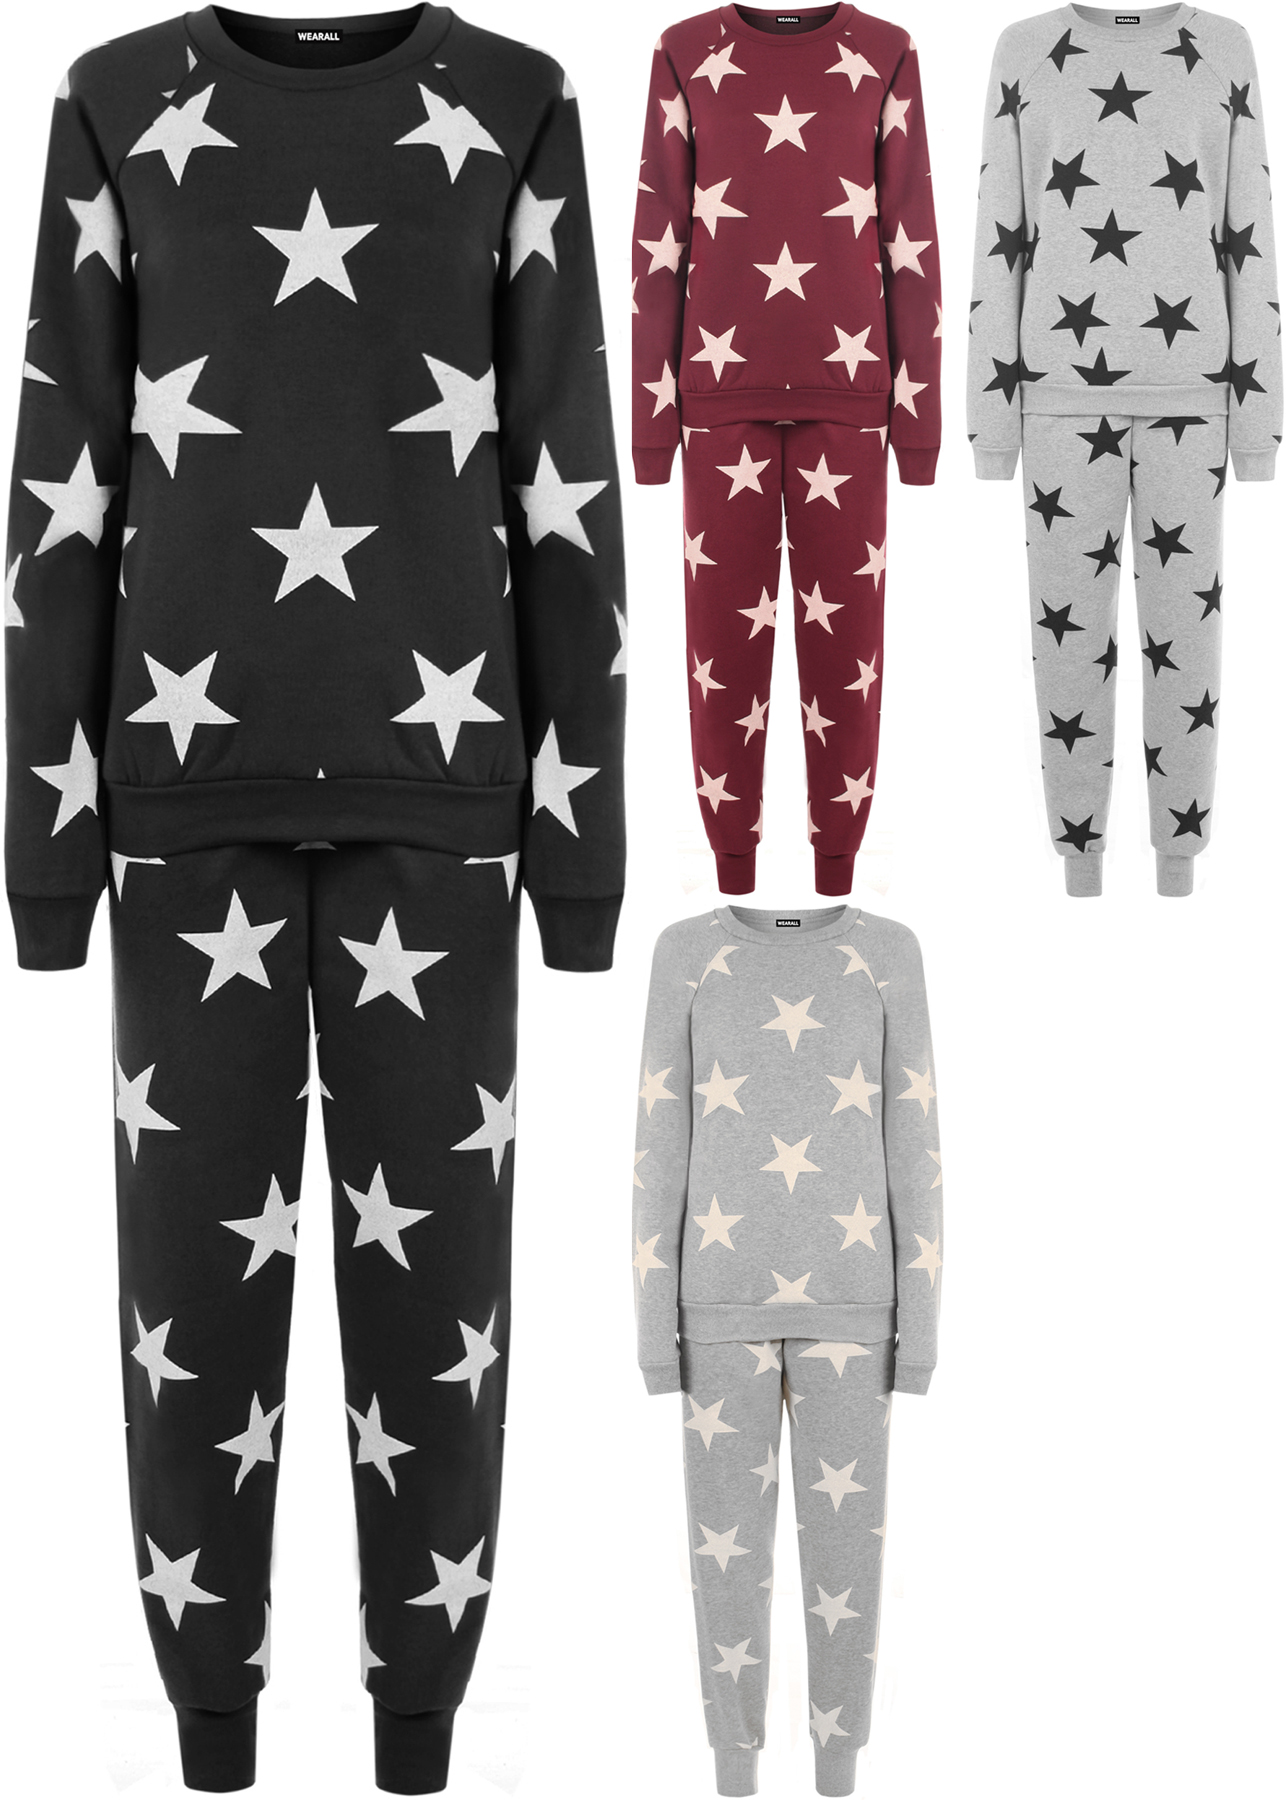 neu damen star druck sweatshirt joggers trainingsanzug einstellen jogging anzug ebay. Black Bedroom Furniture Sets. Home Design Ideas